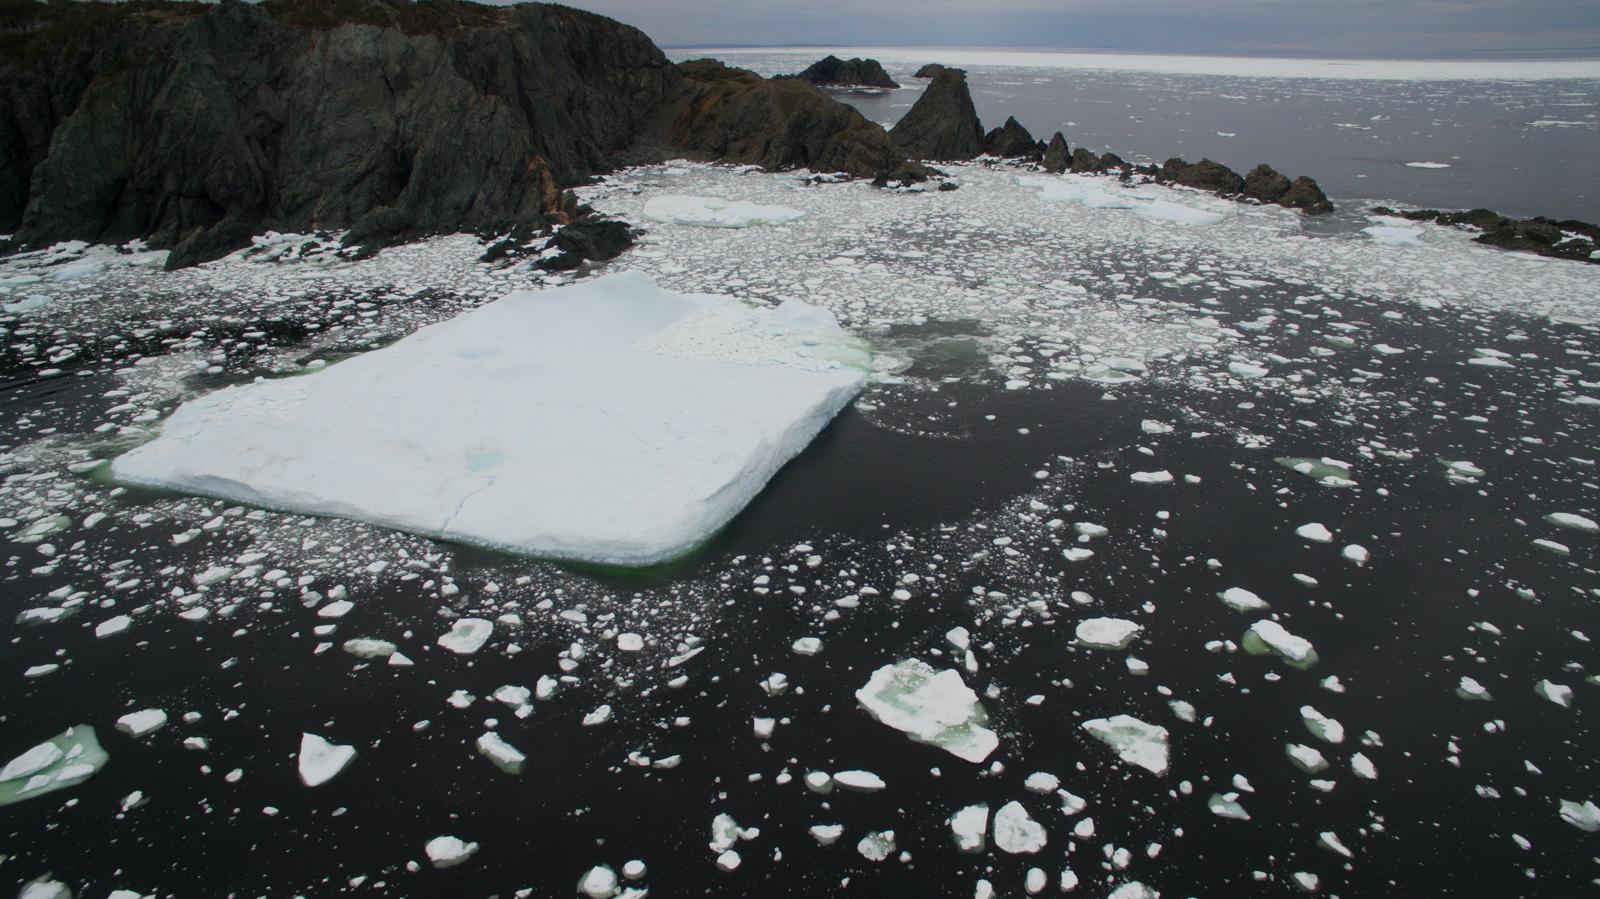 2017.06.17.NFLD.Twilingate_Icebergs.DJI.Photos_0013.jpg